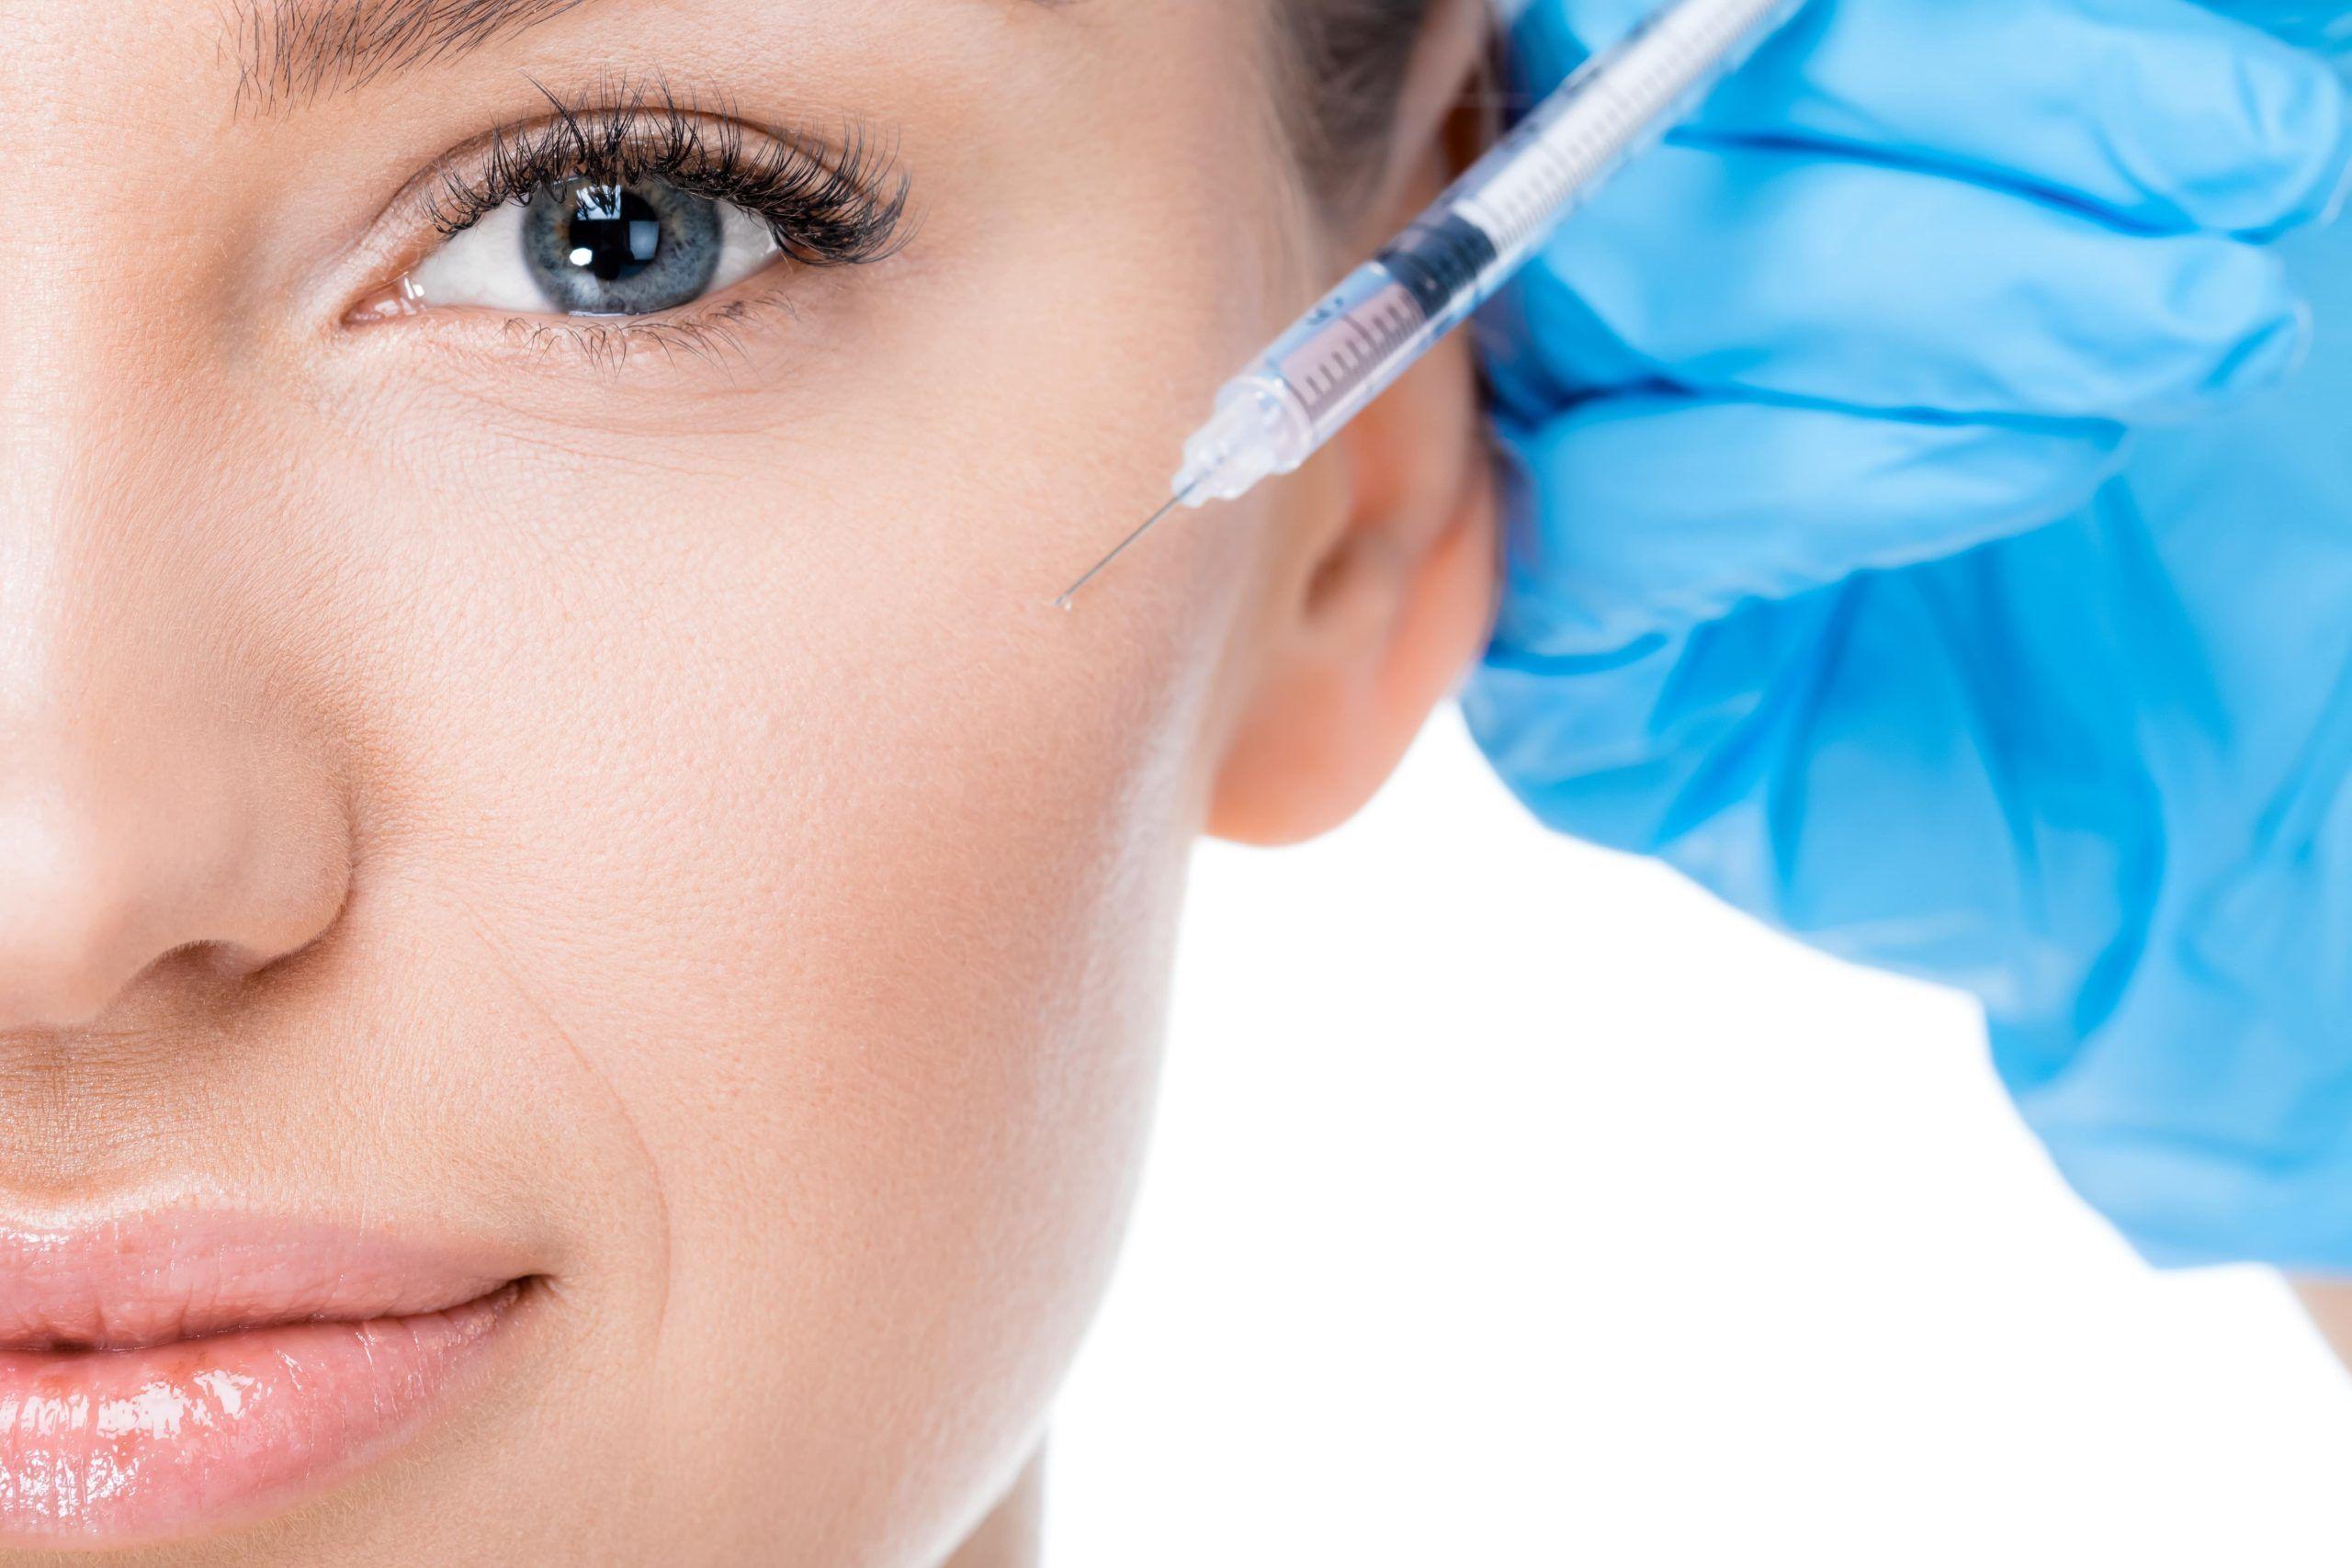 Faltenunterspritzung Gesicht Frau Mira-Beau